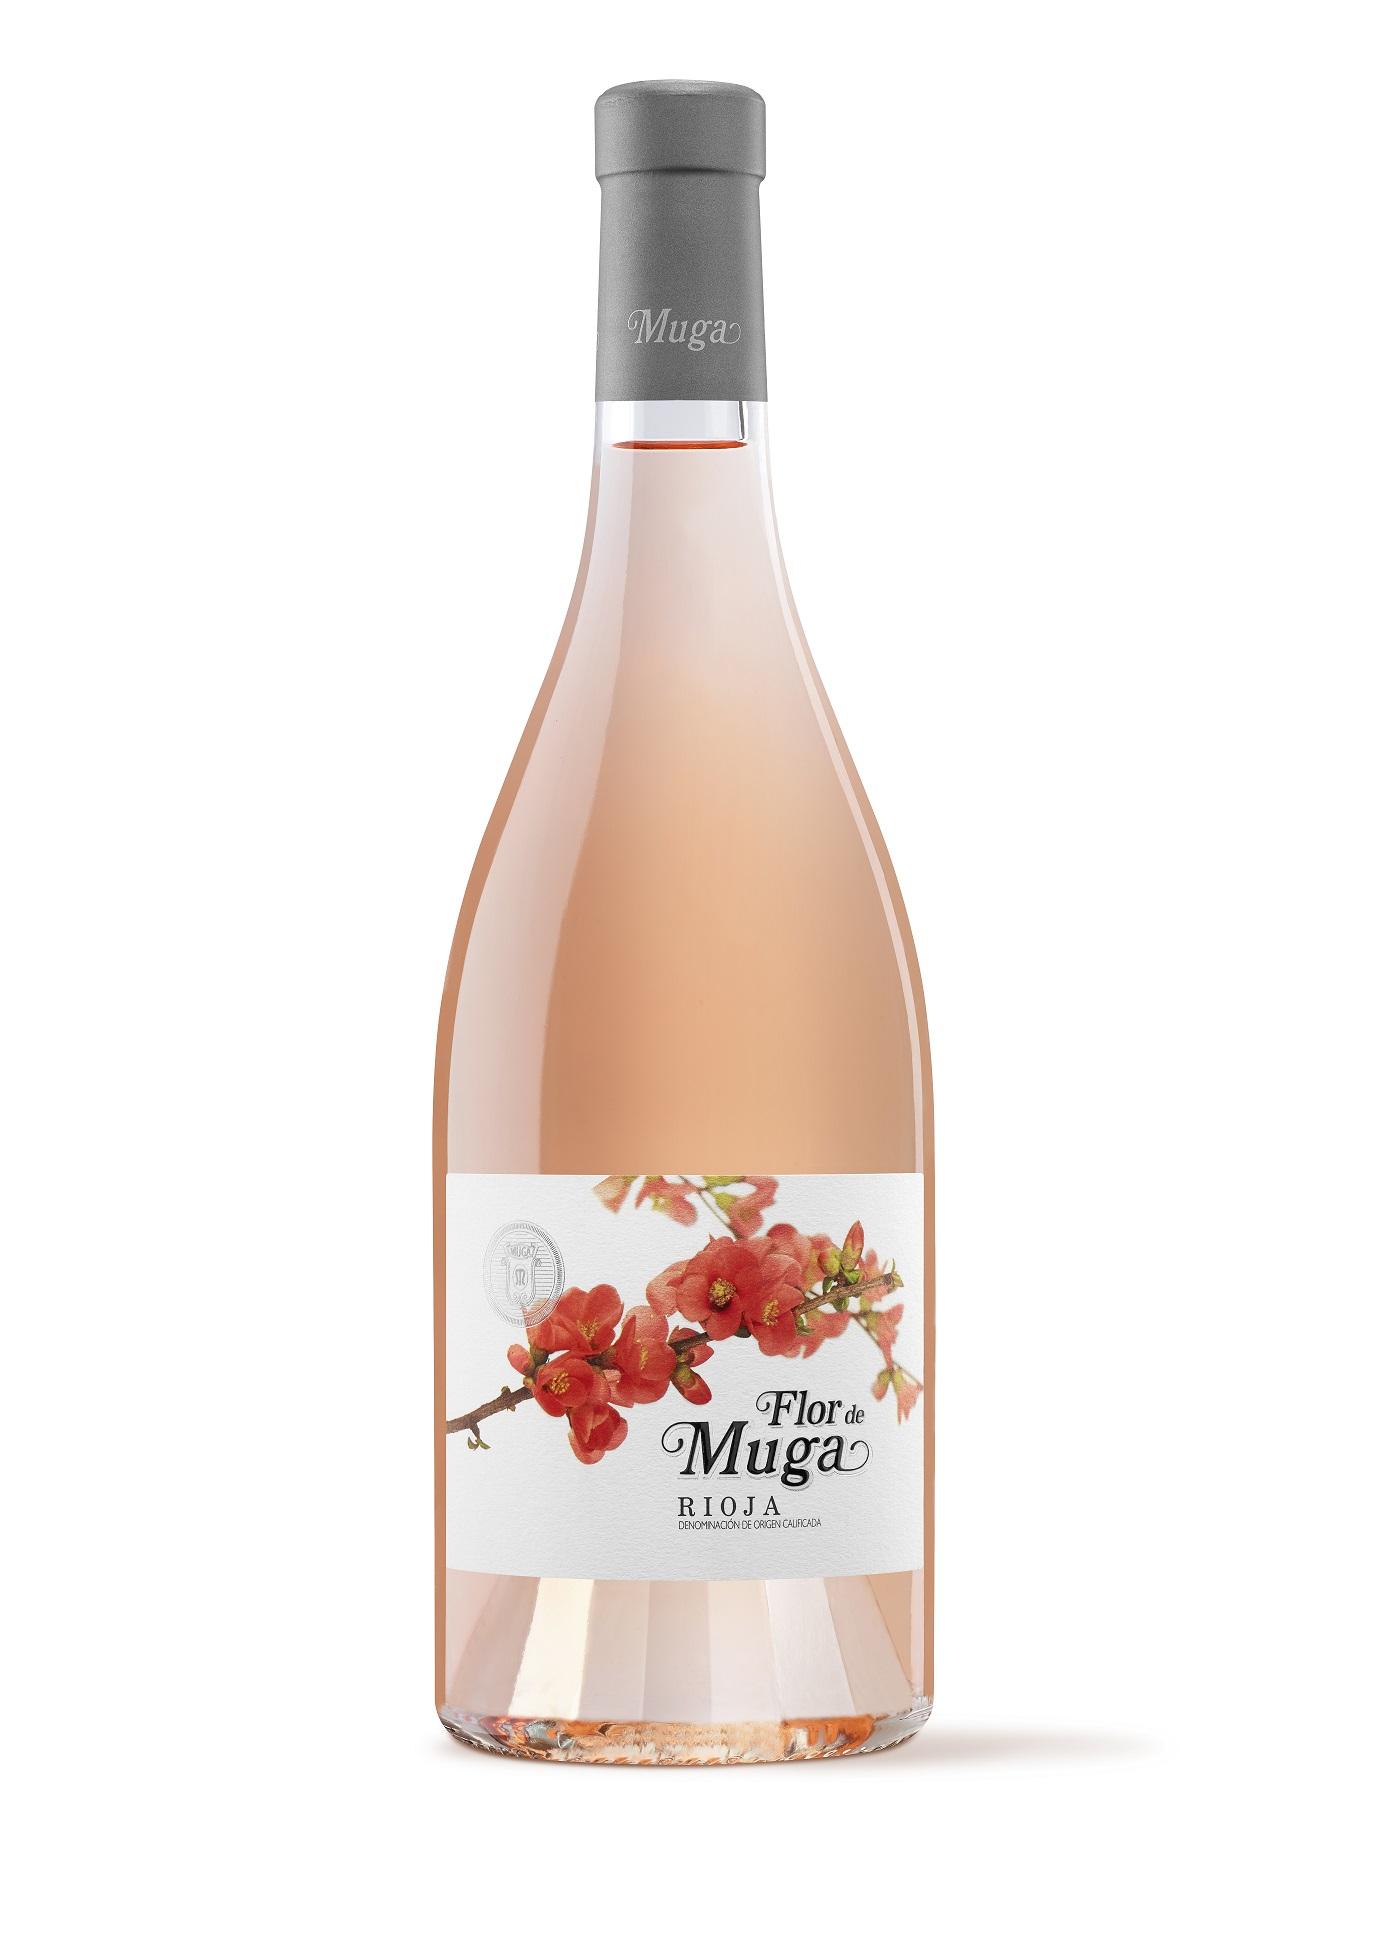 Pedro Ballesteros MW葡萄酒大师班:里奥哈的多样与包容